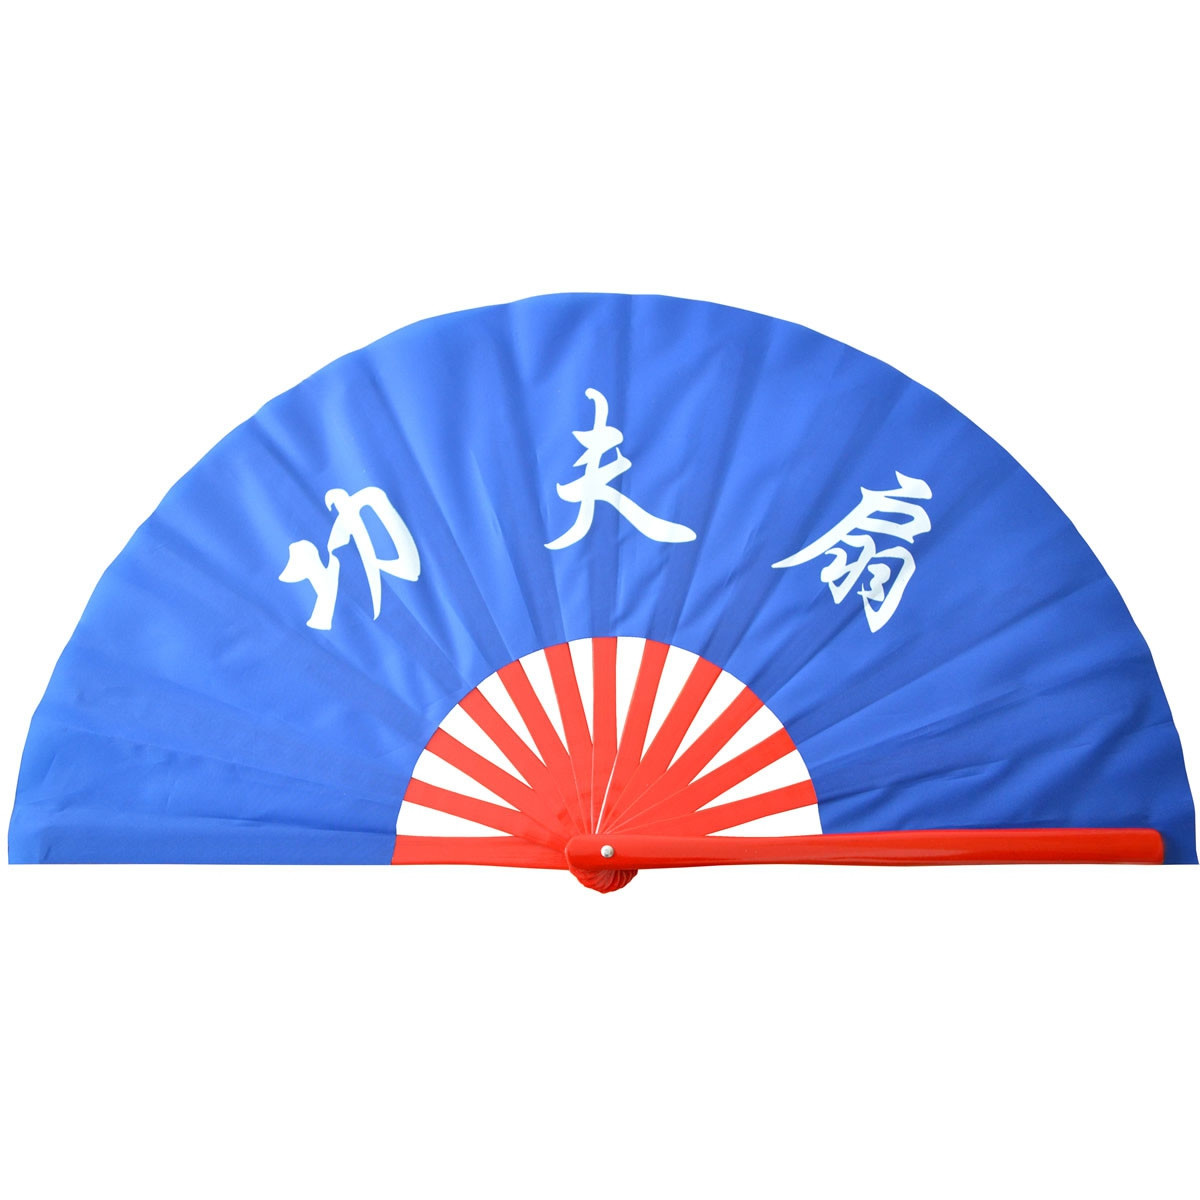 Tai Chi Kung Fu Bamboo Fan - White Chinese characters Kung Fu Shan